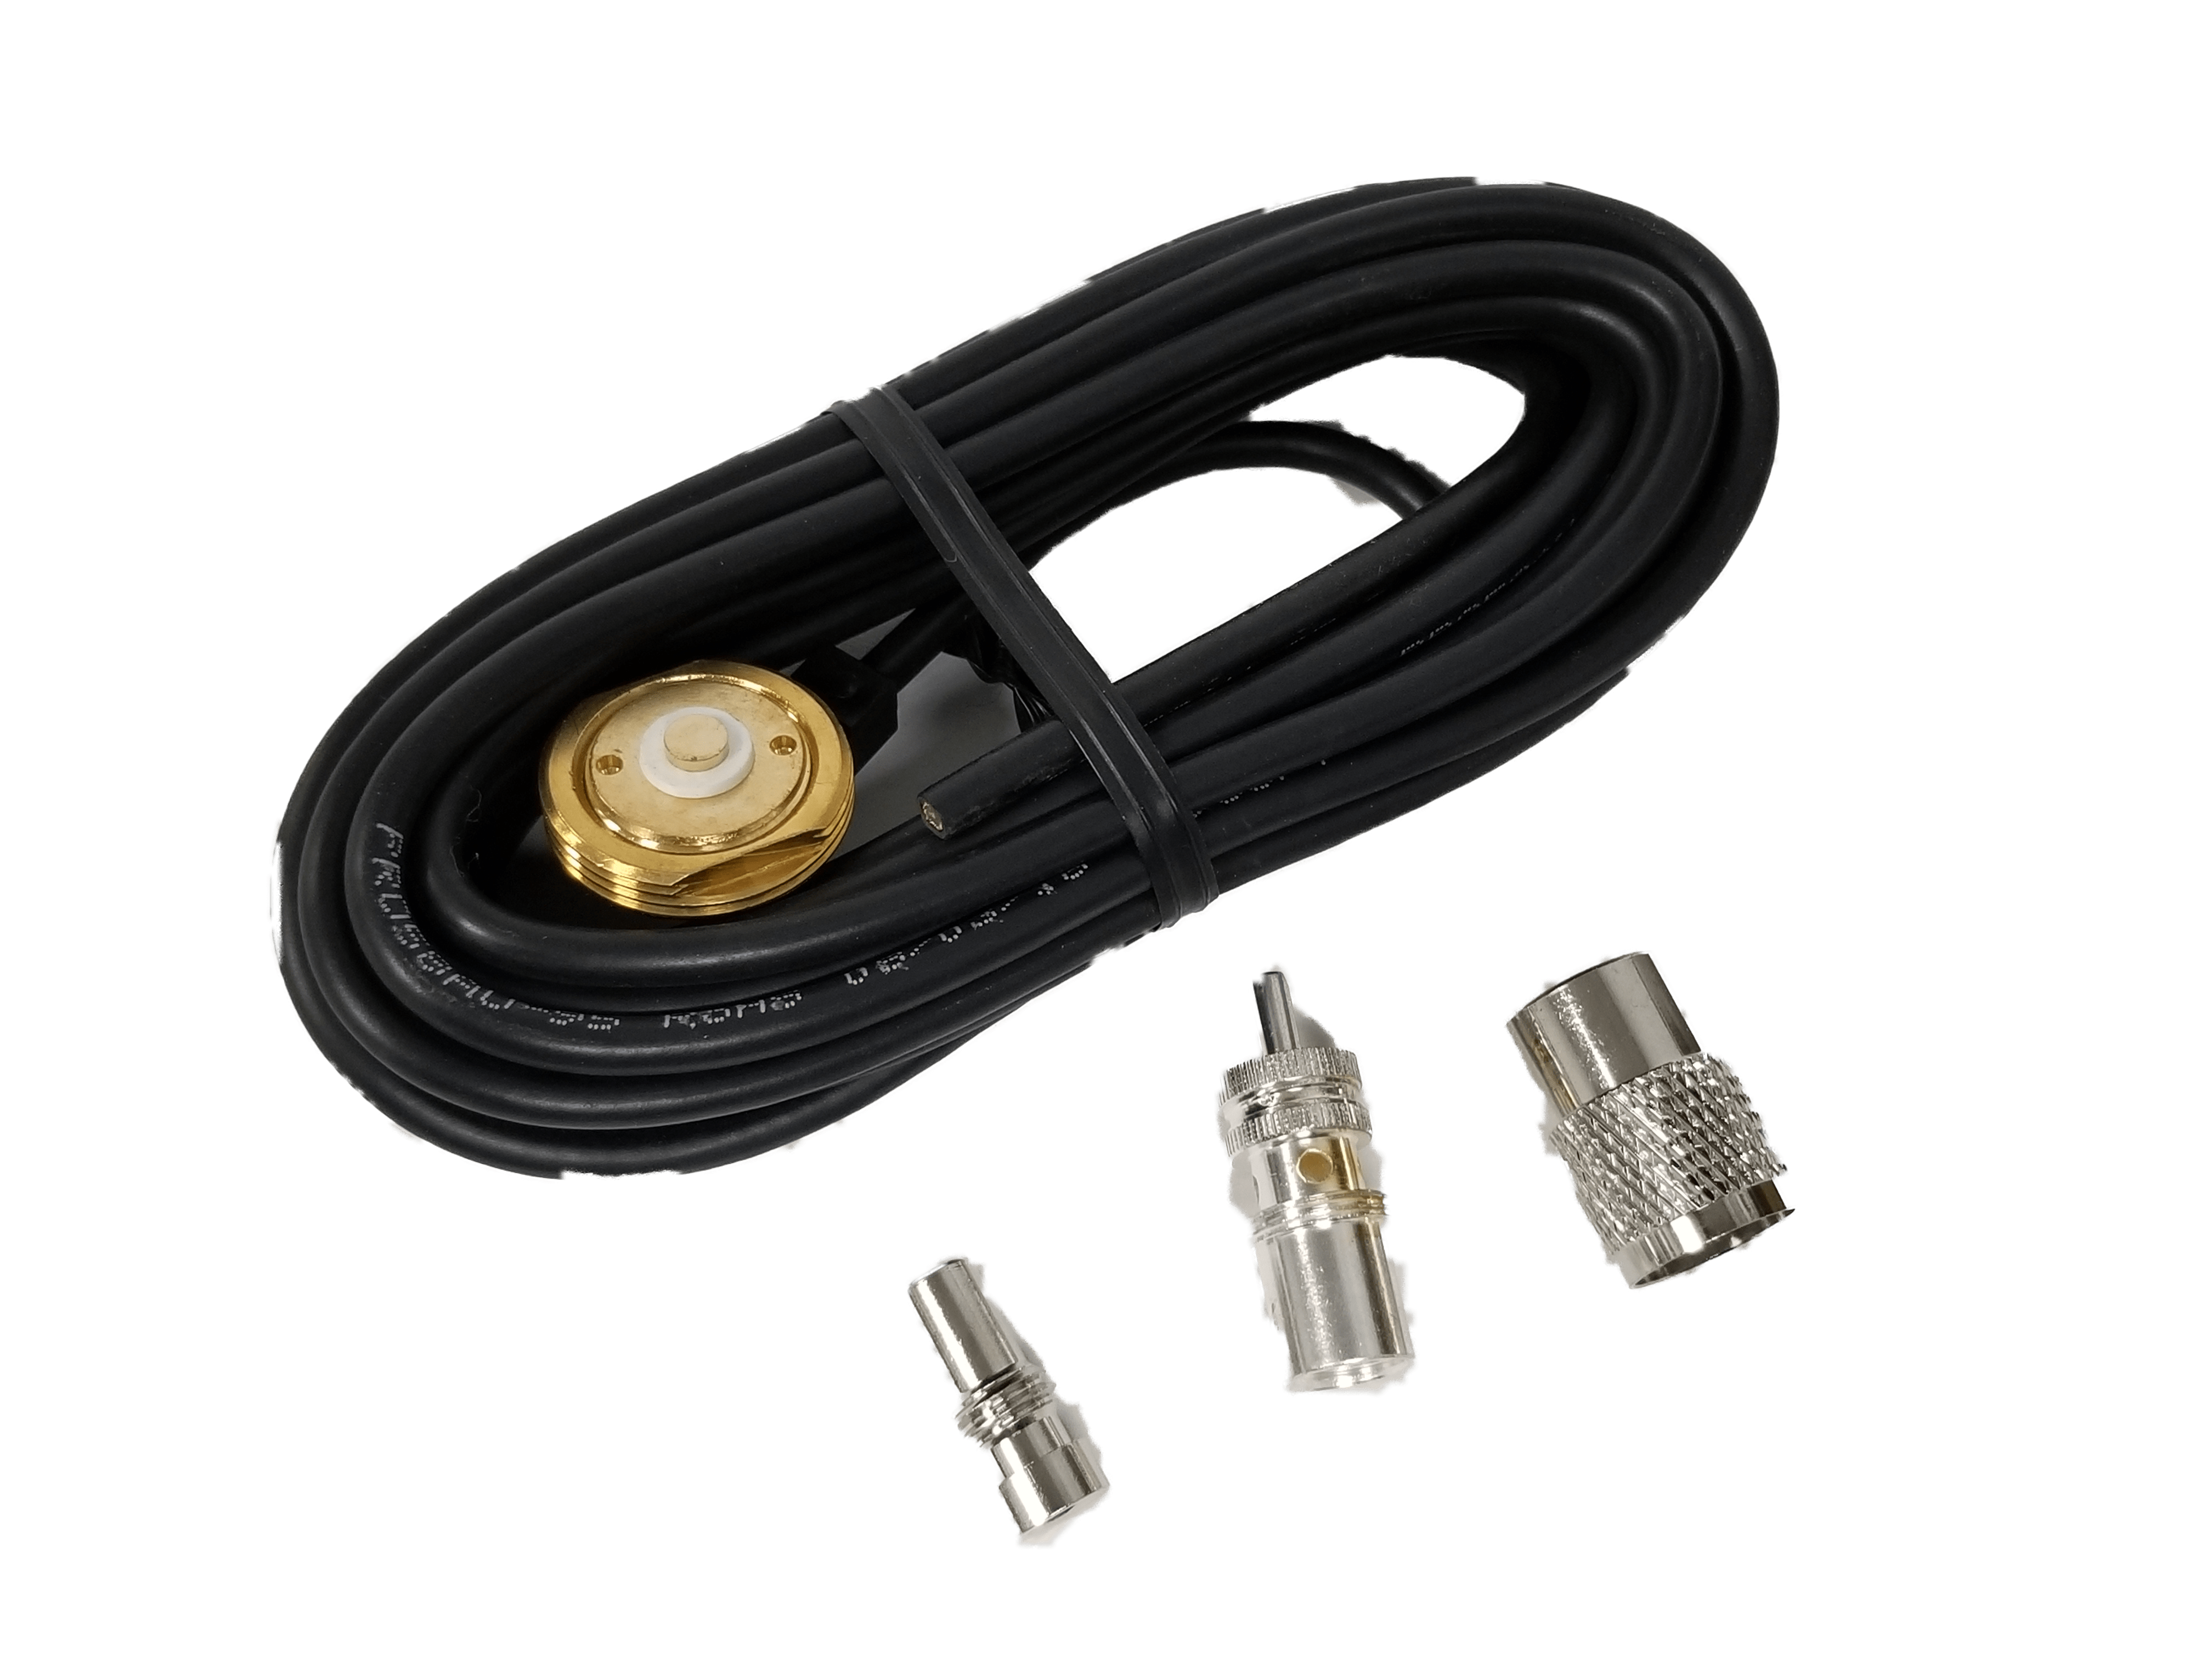 MSM17LPL - ProComm Nmo Style 17' Coax W/ Unsoldered Pl259